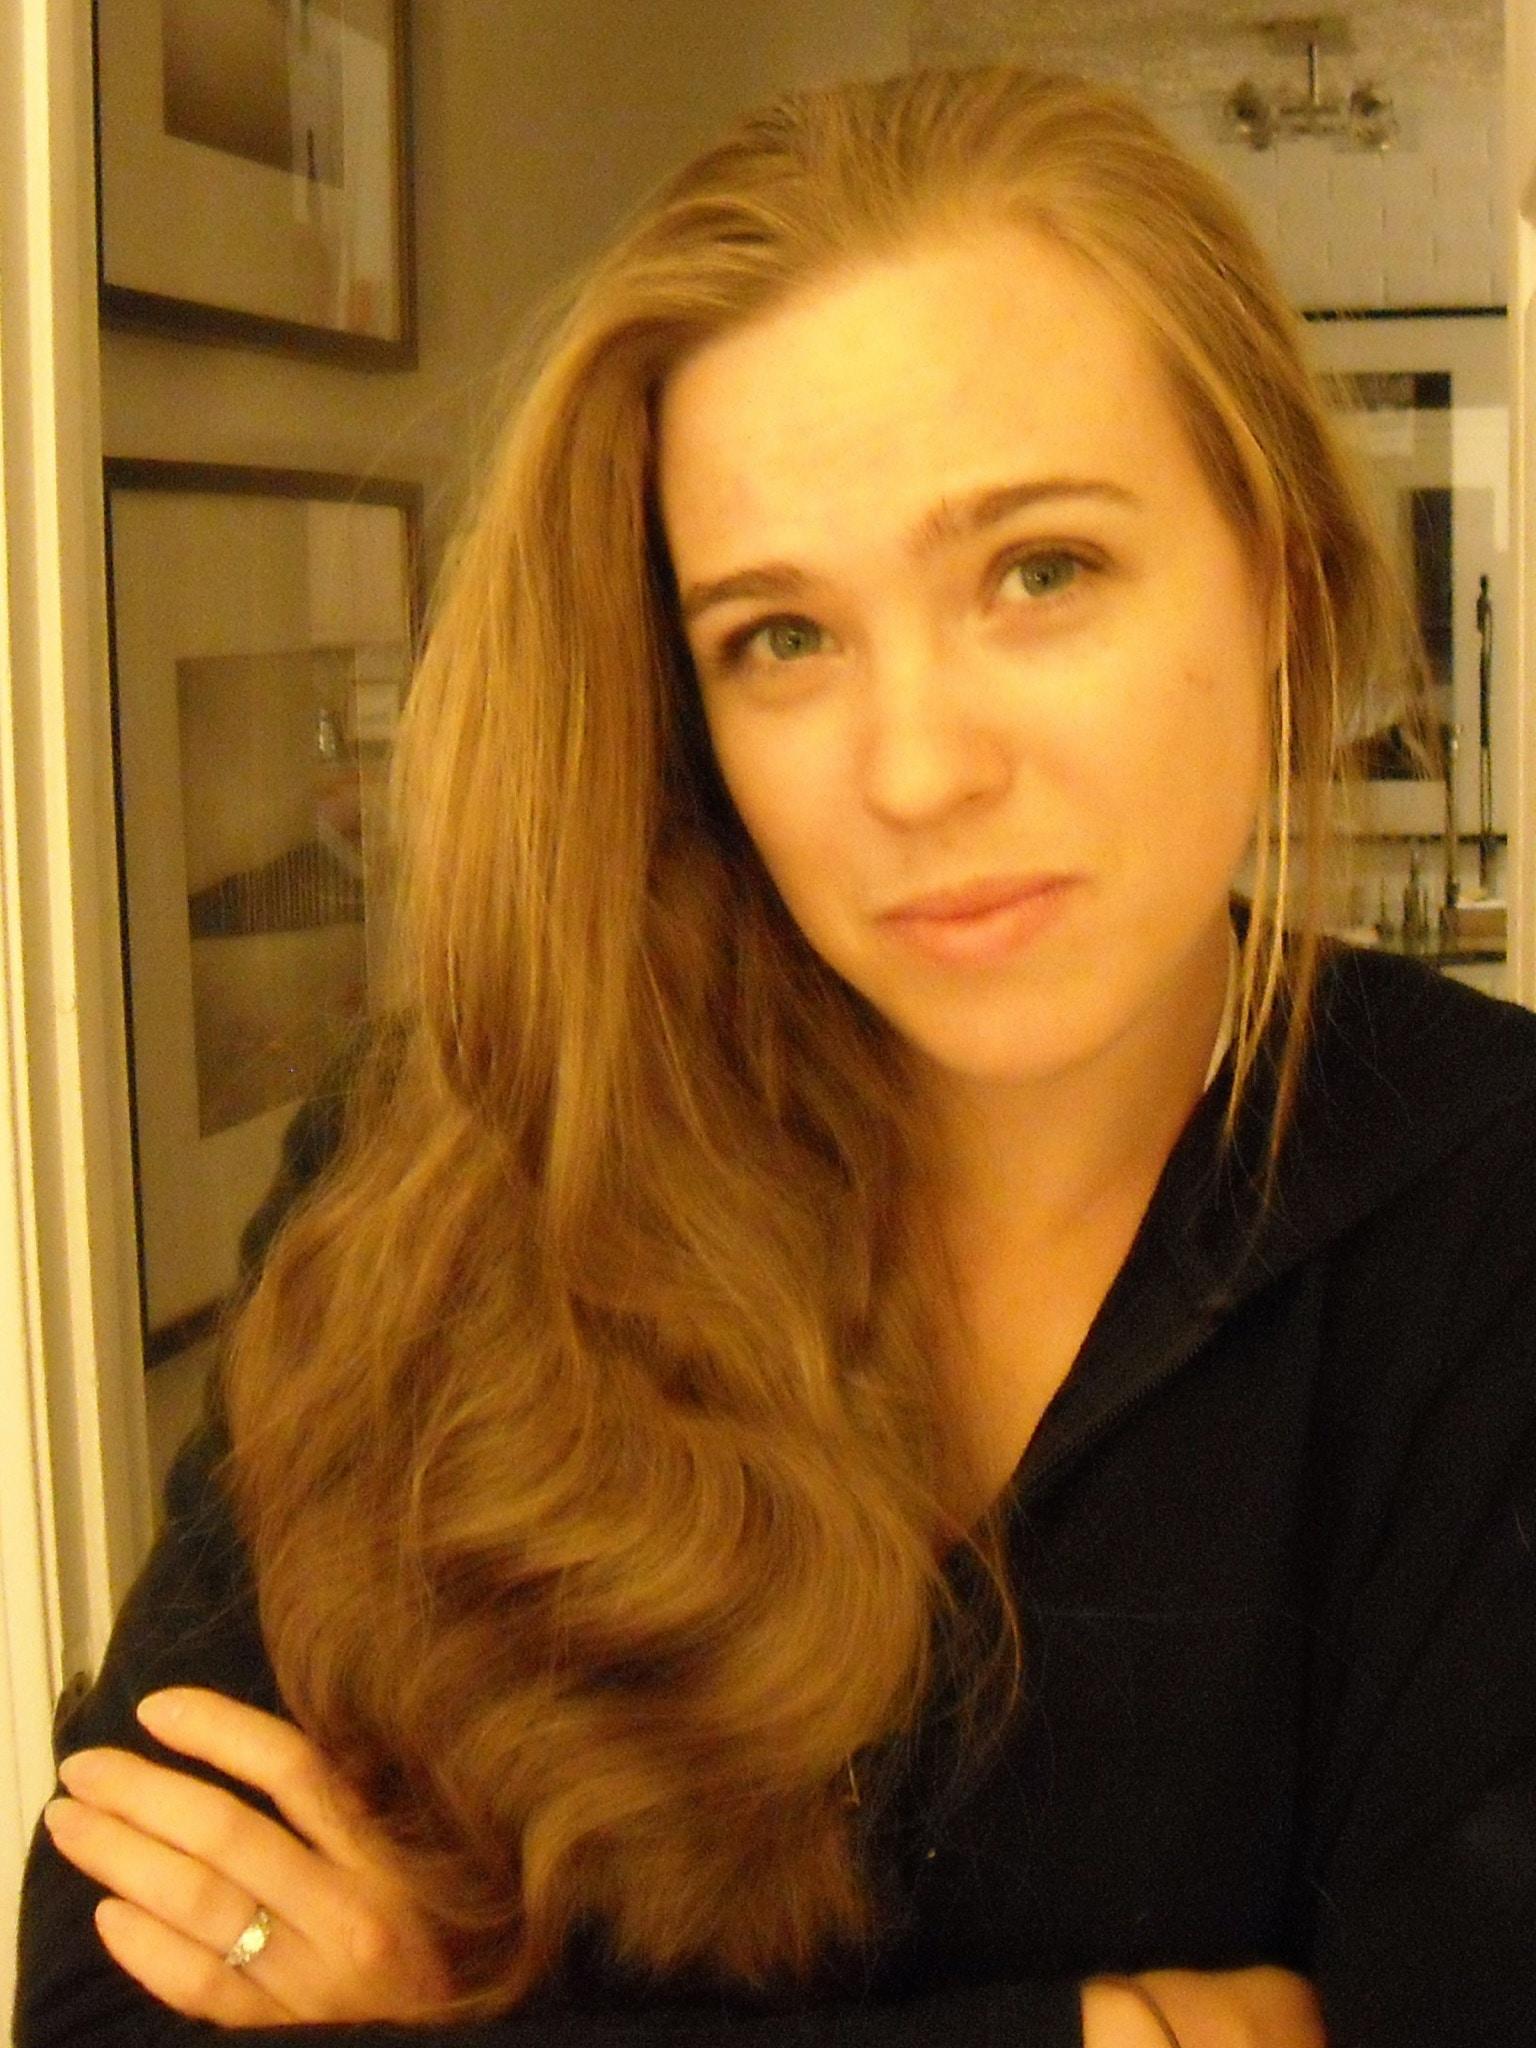 Go to Eirene Ritznore's profile